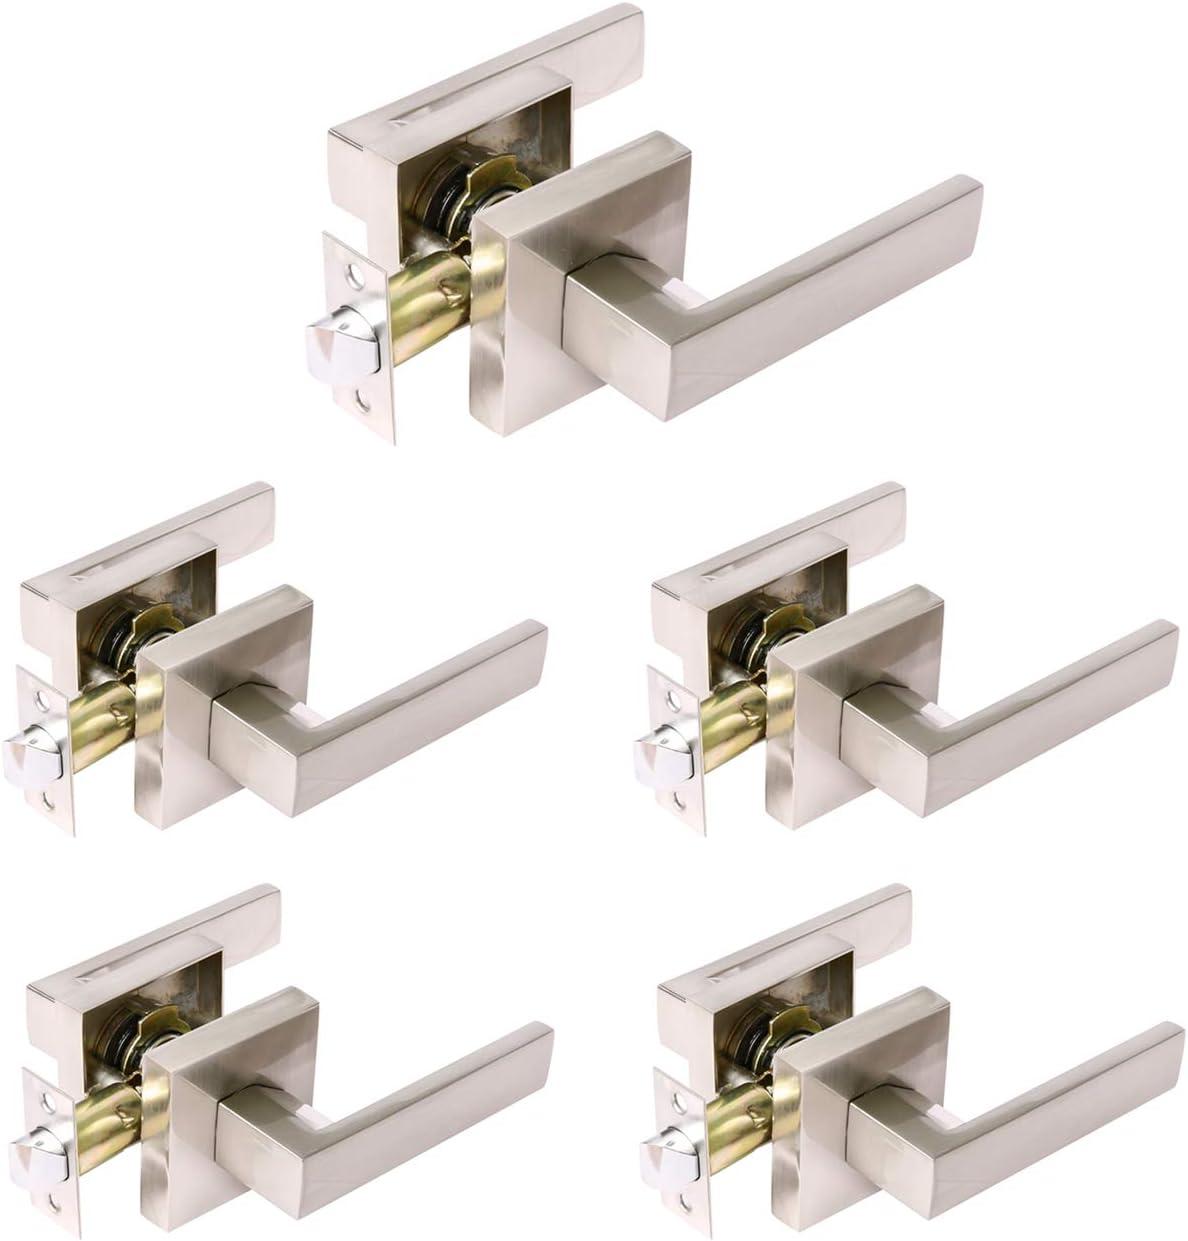 10 Pcs Heavy Duty Keyed Entry Door Knobs Door Lock Set Satin Nickel Finish Entrance Lever with Different Keys for Front//Exterior Doors